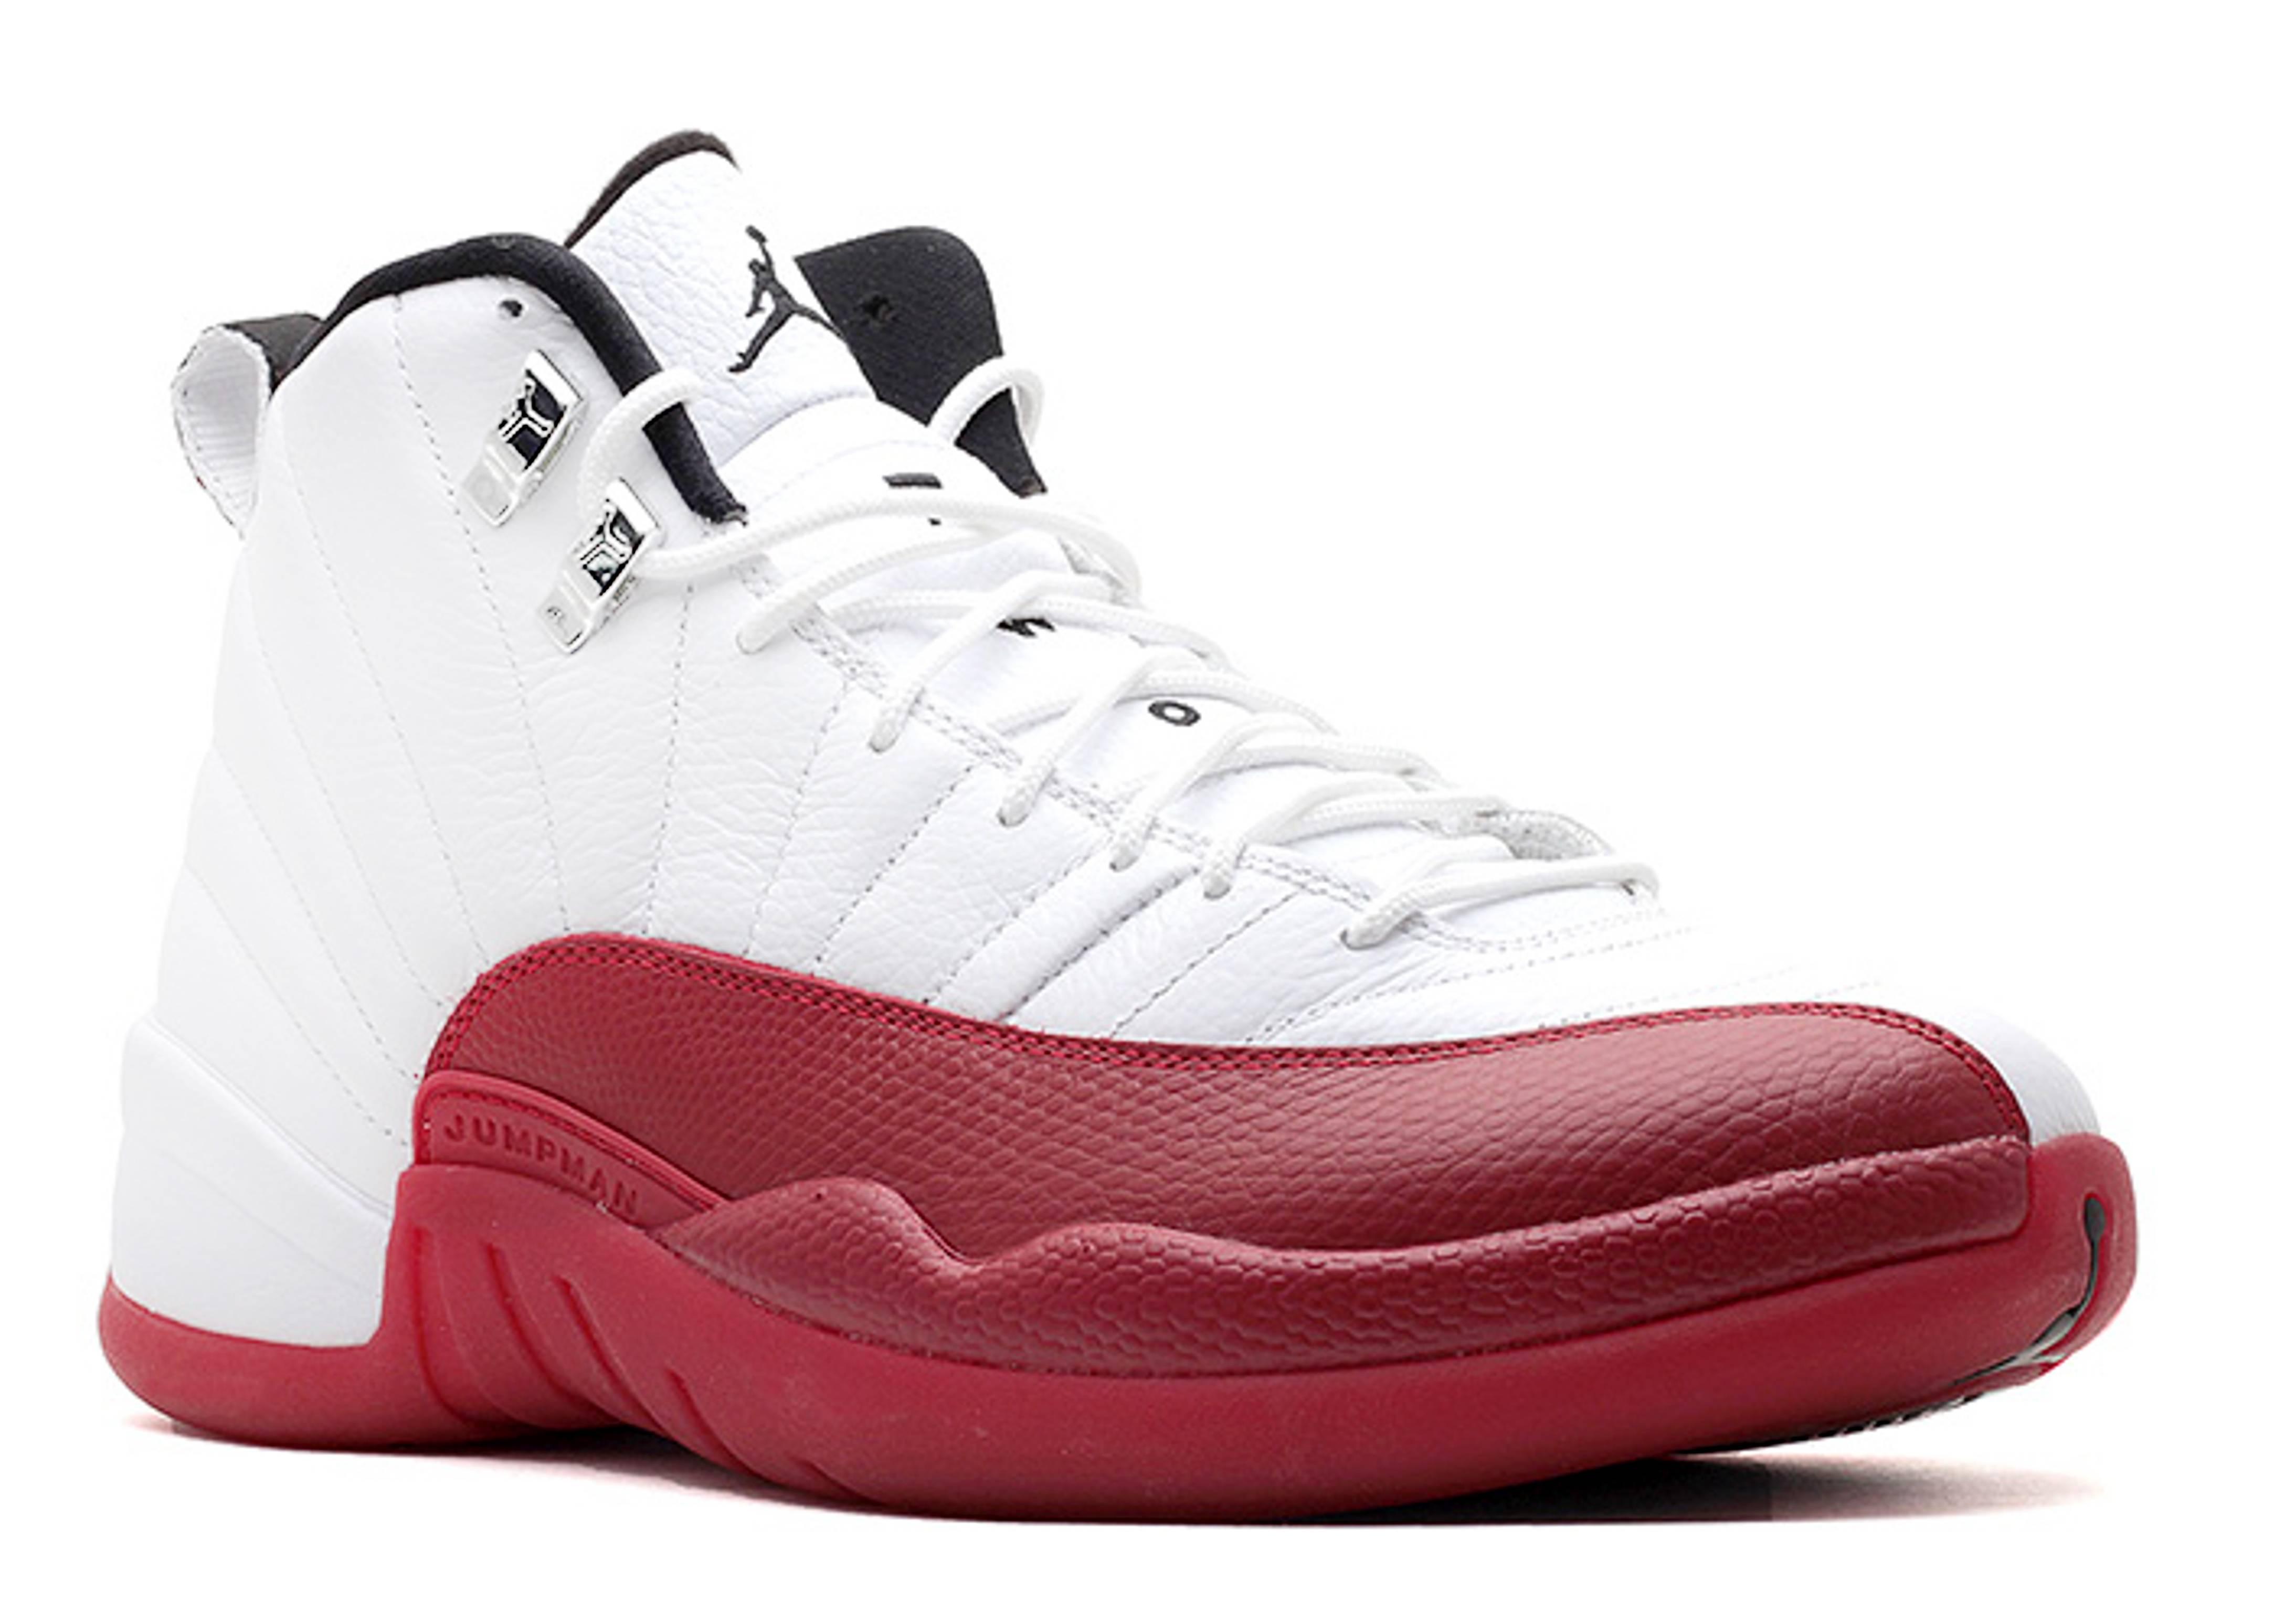 new product f74b2 d3e93 ... Red White Black Release Date  air jordan 12 retro ...